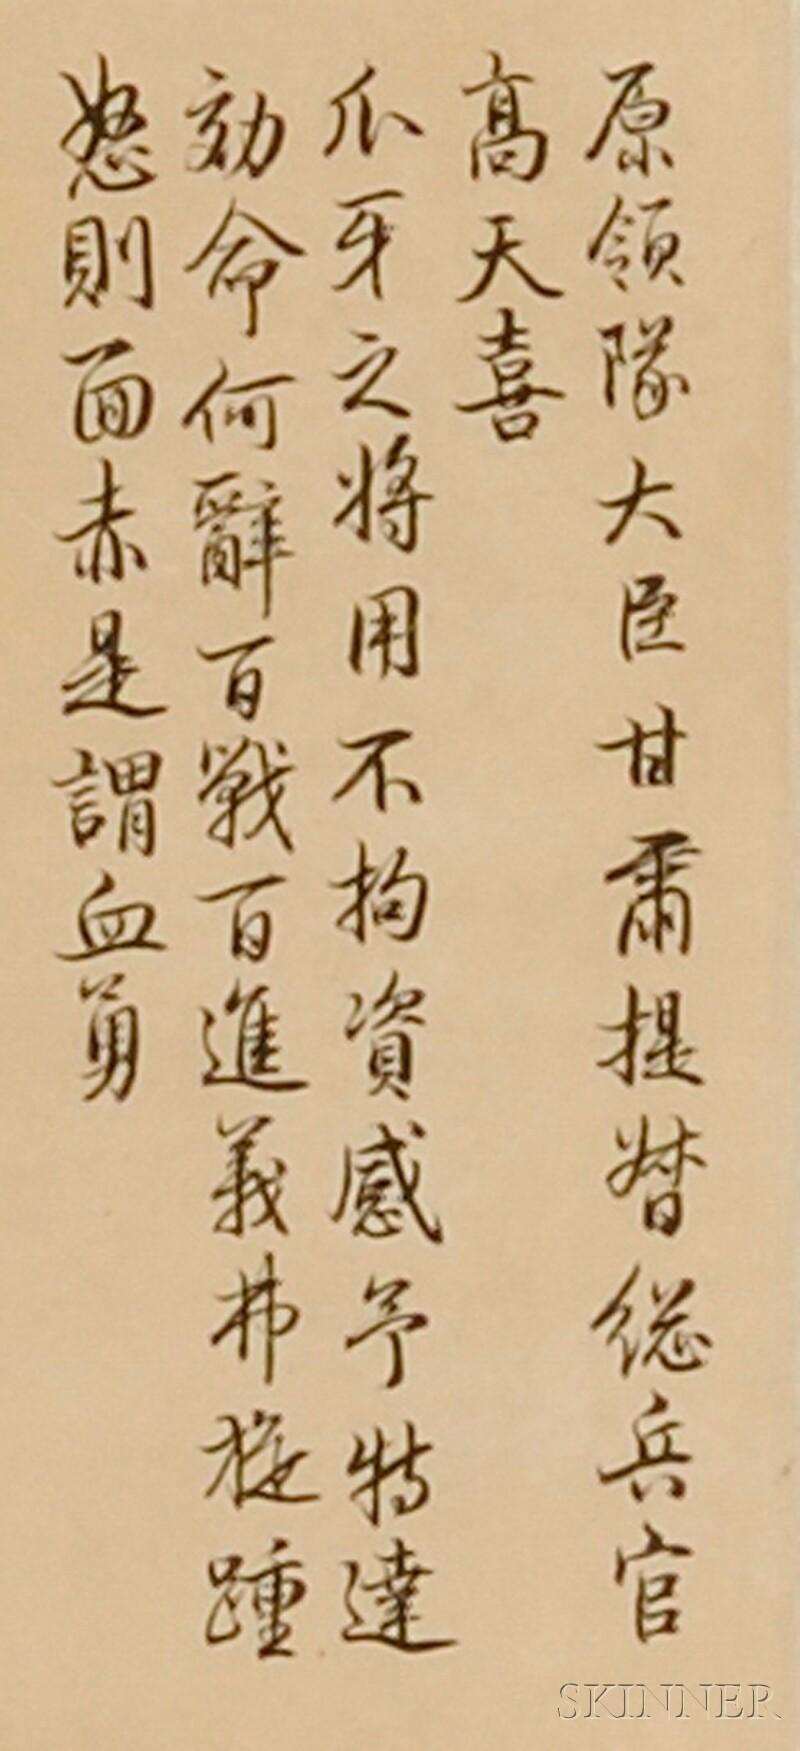 Handscroll